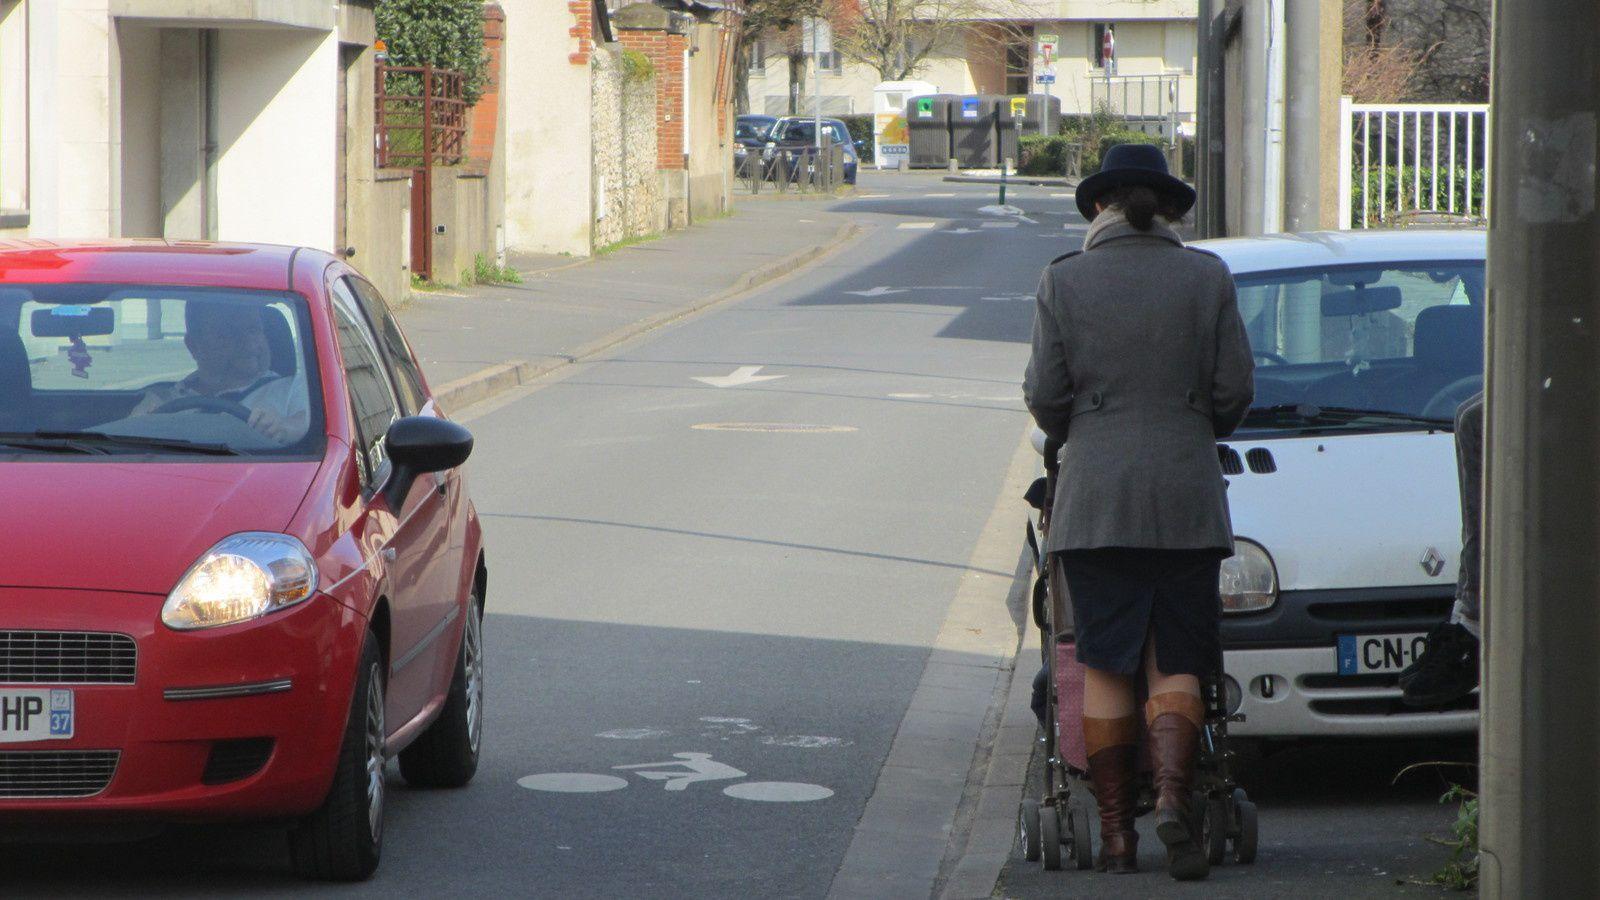 Blois rue d'Artois